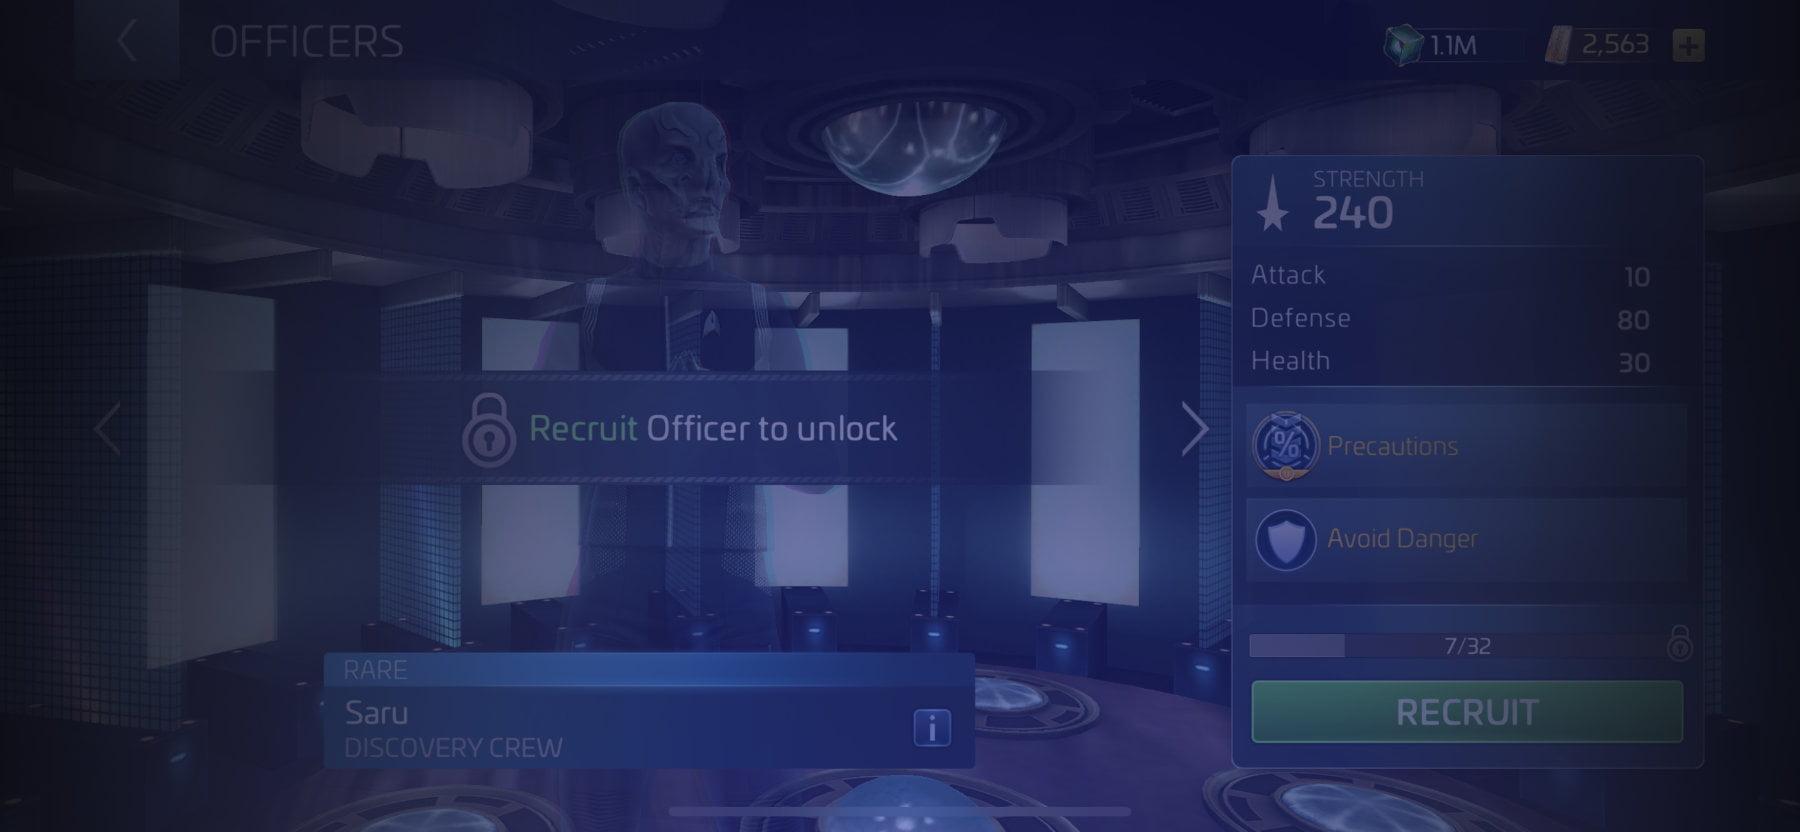 Officer Saru